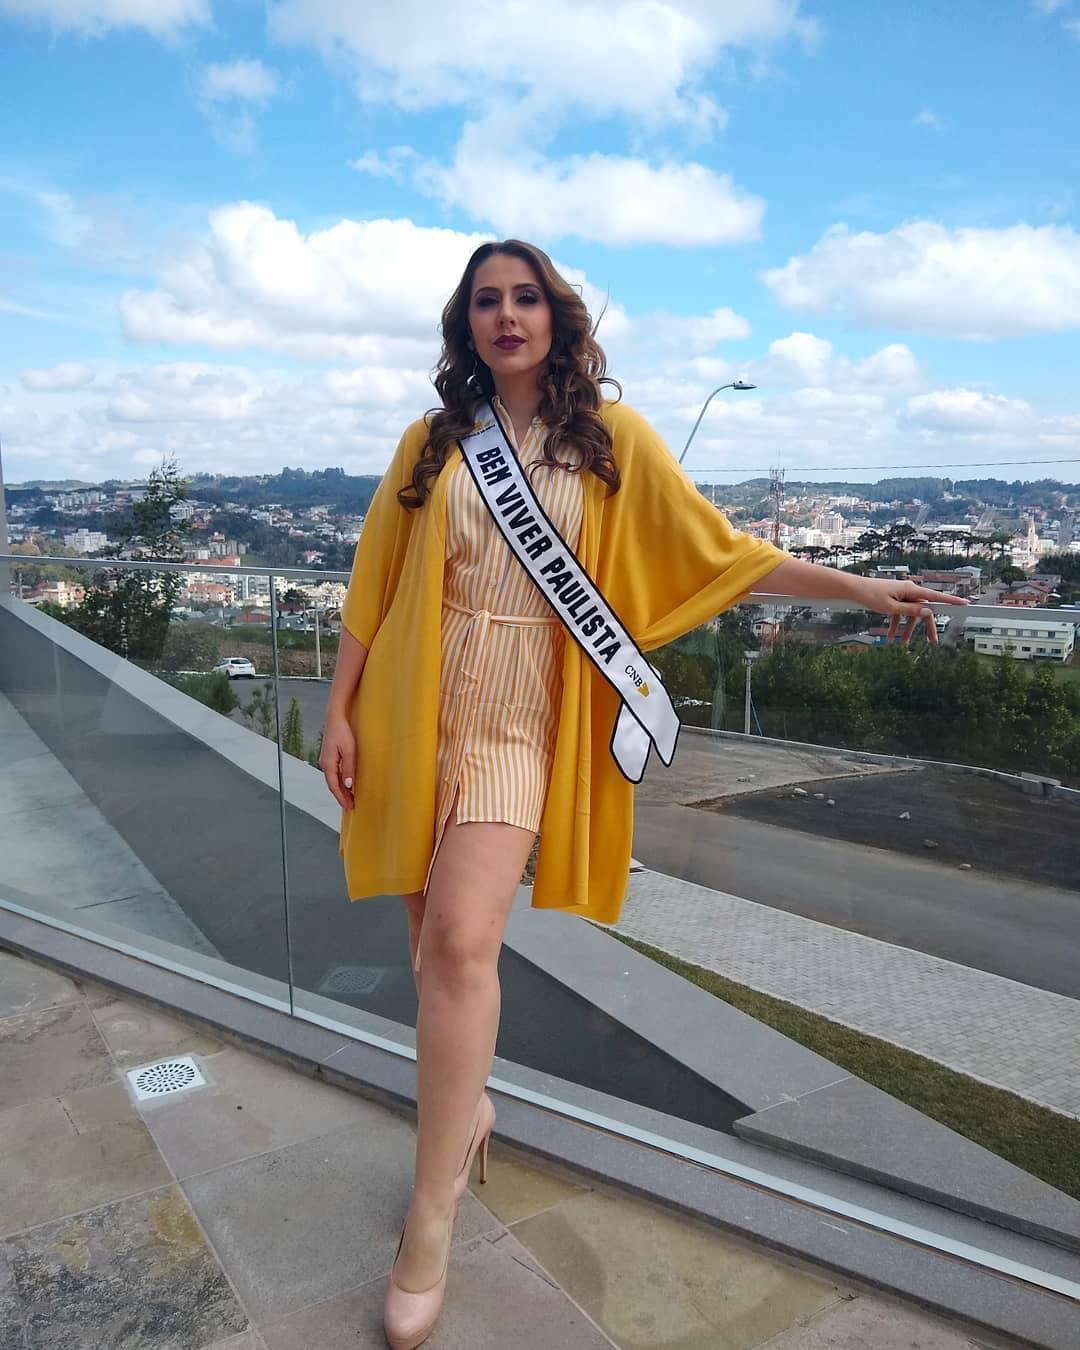 giovanna coltro, miss bem viver paulista mundo 2019. - Página 3 11615340